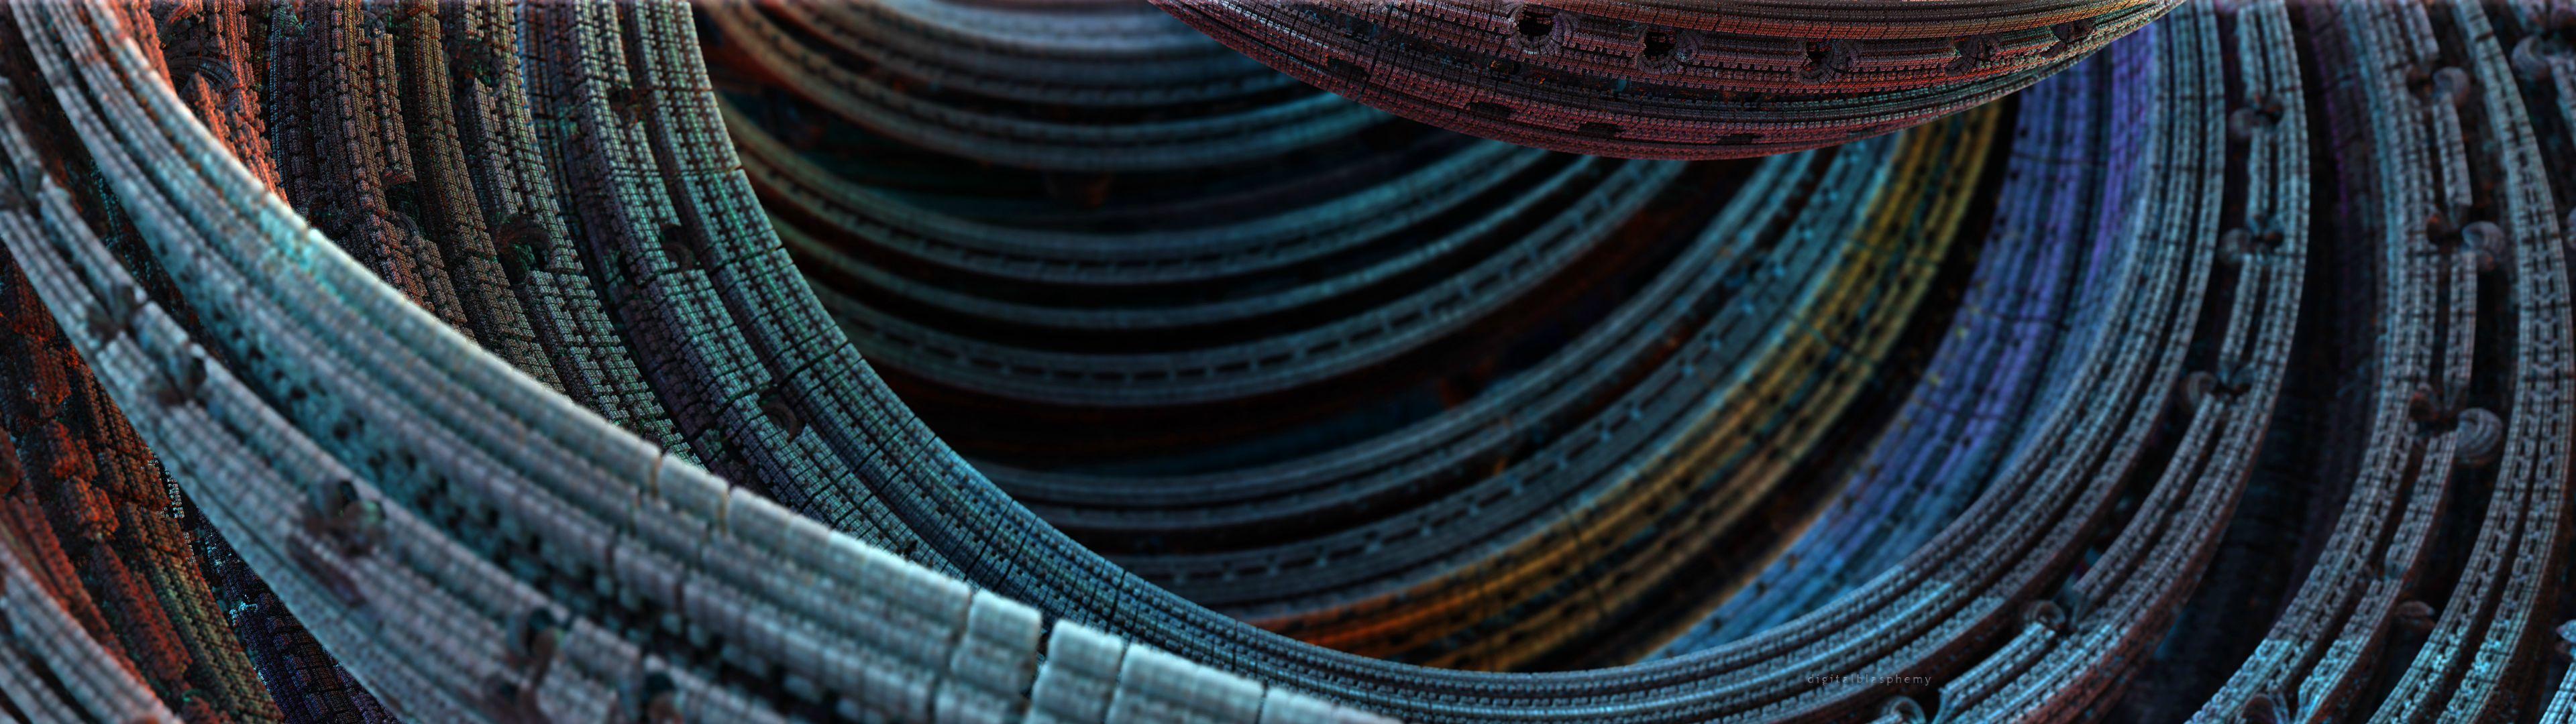 Dual Screen 1080p Wallpapers - Album on Imgur